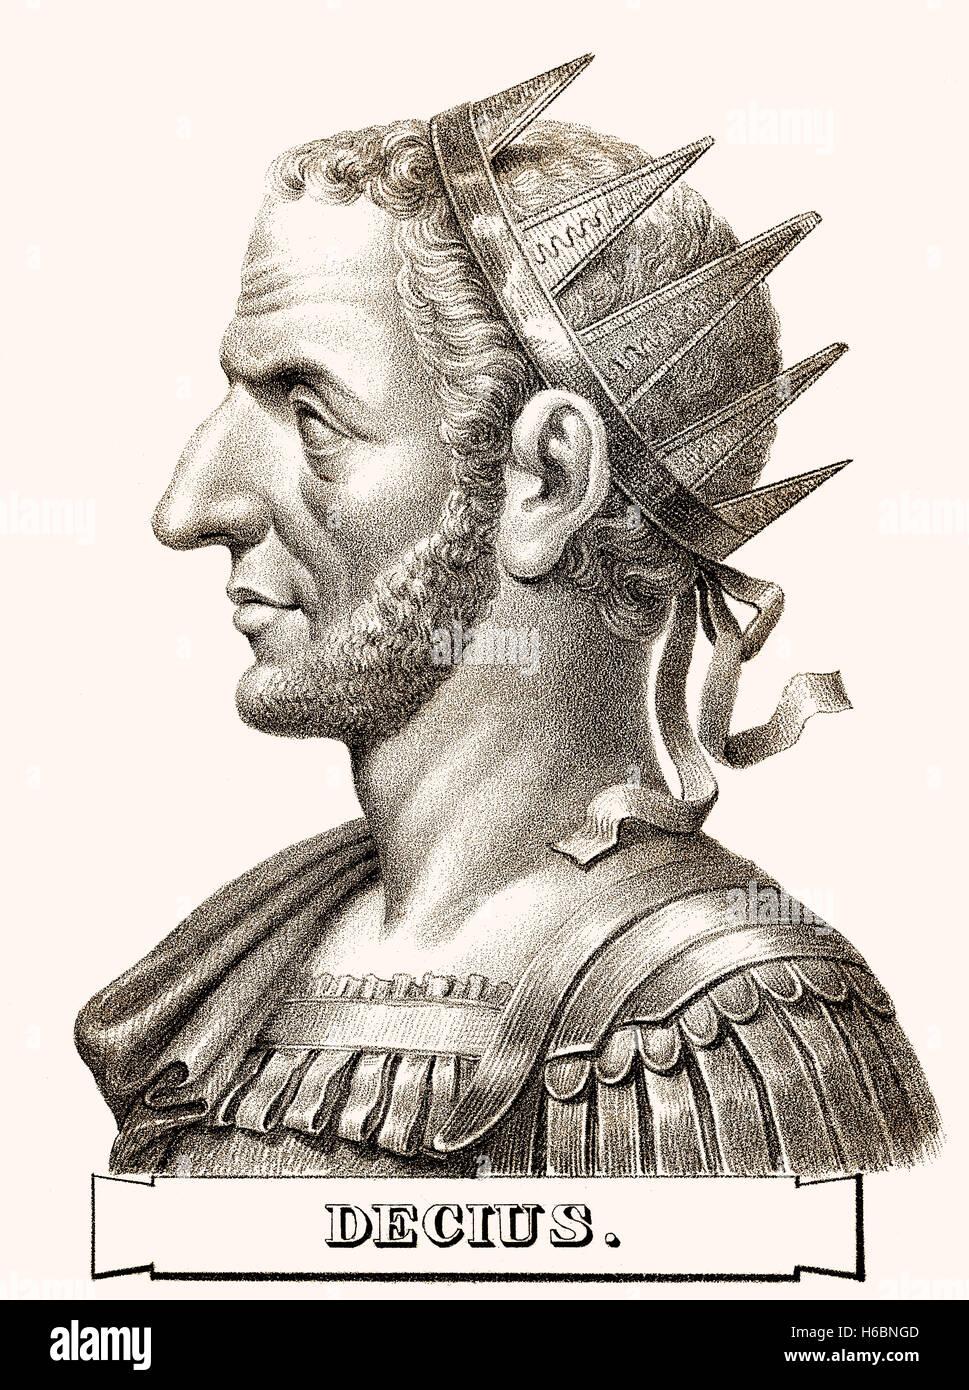 Trajan Decius, c. 201-251, römischer Kaiser Stockbild